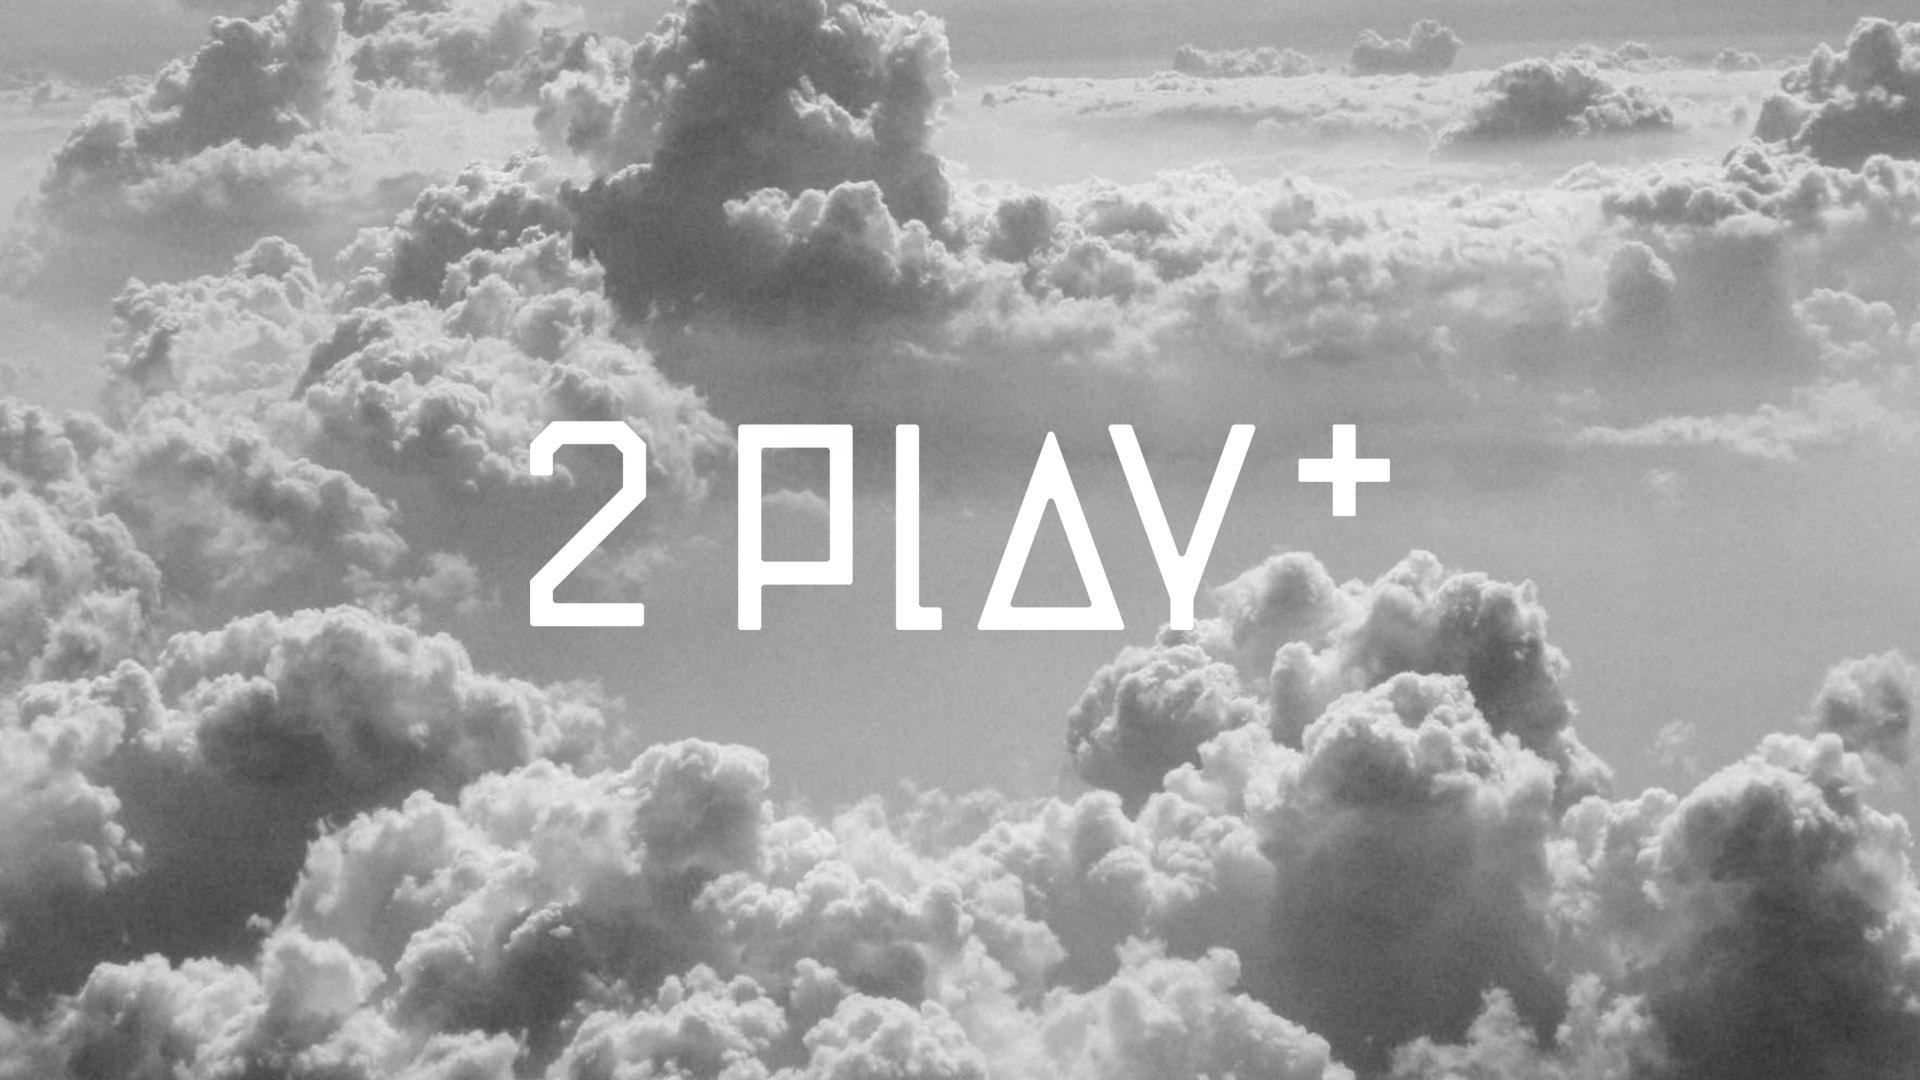 (c) 2playmore.pt